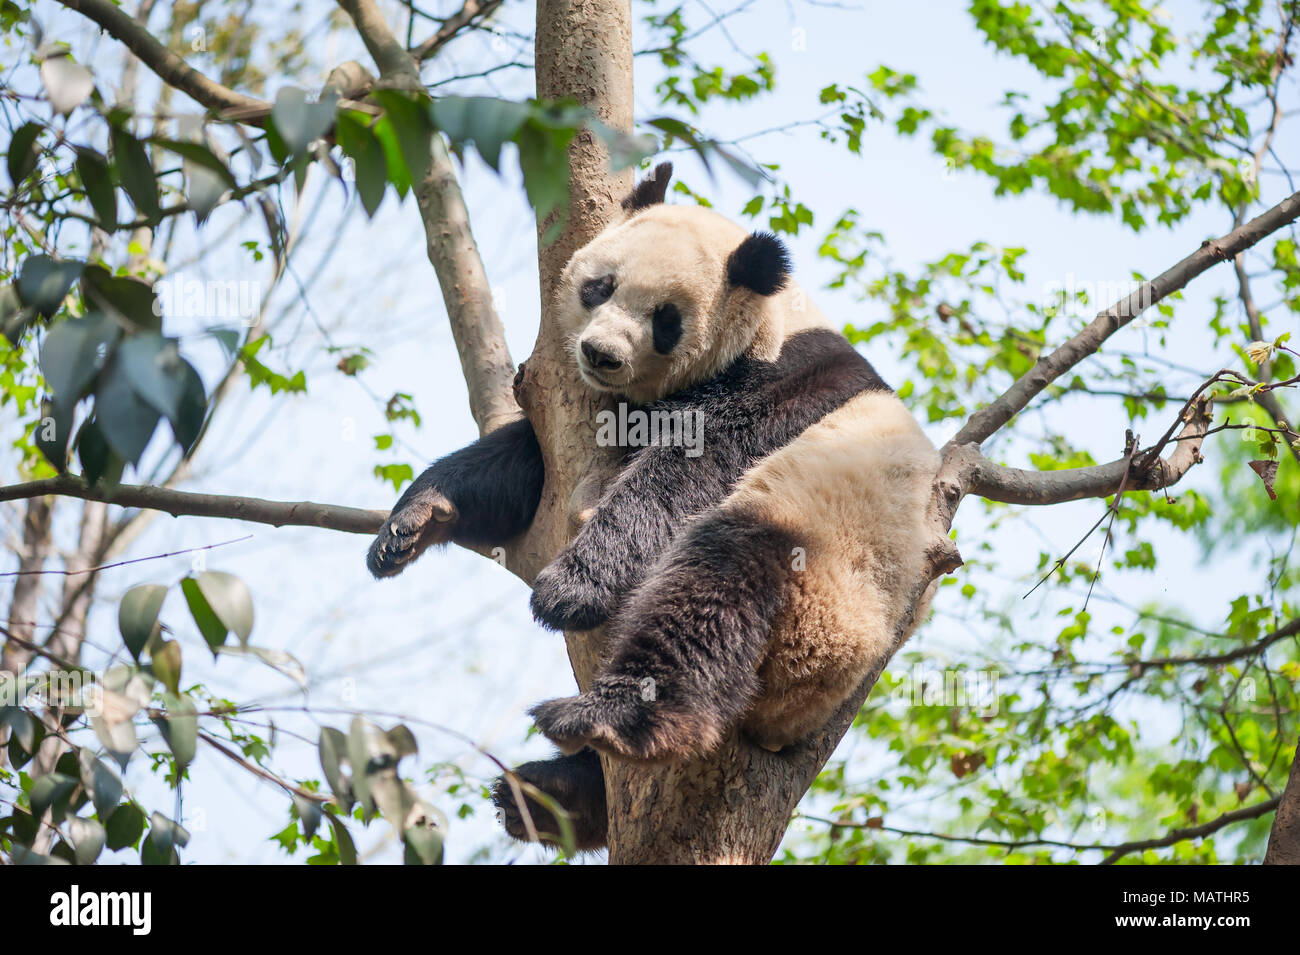 Giant panda sleeping in a tree, Chengdu, China - Stock Image